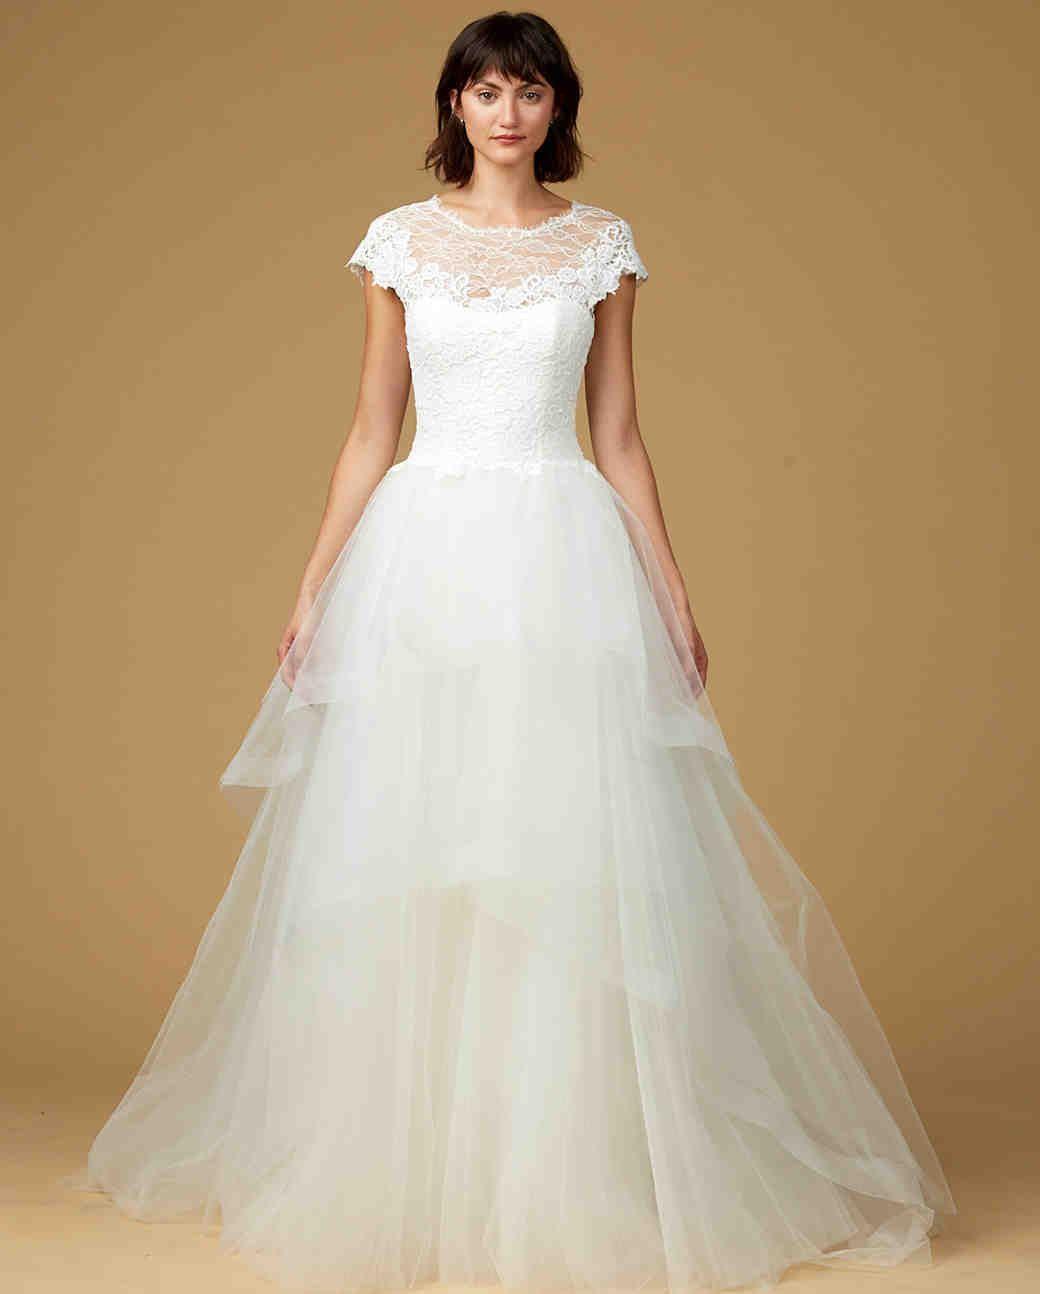 Amsale Nouvelle Fall 2017 Wedding Dress Collection | Martha Stewart Weddings – Short-sleeve ball gown wedding dress